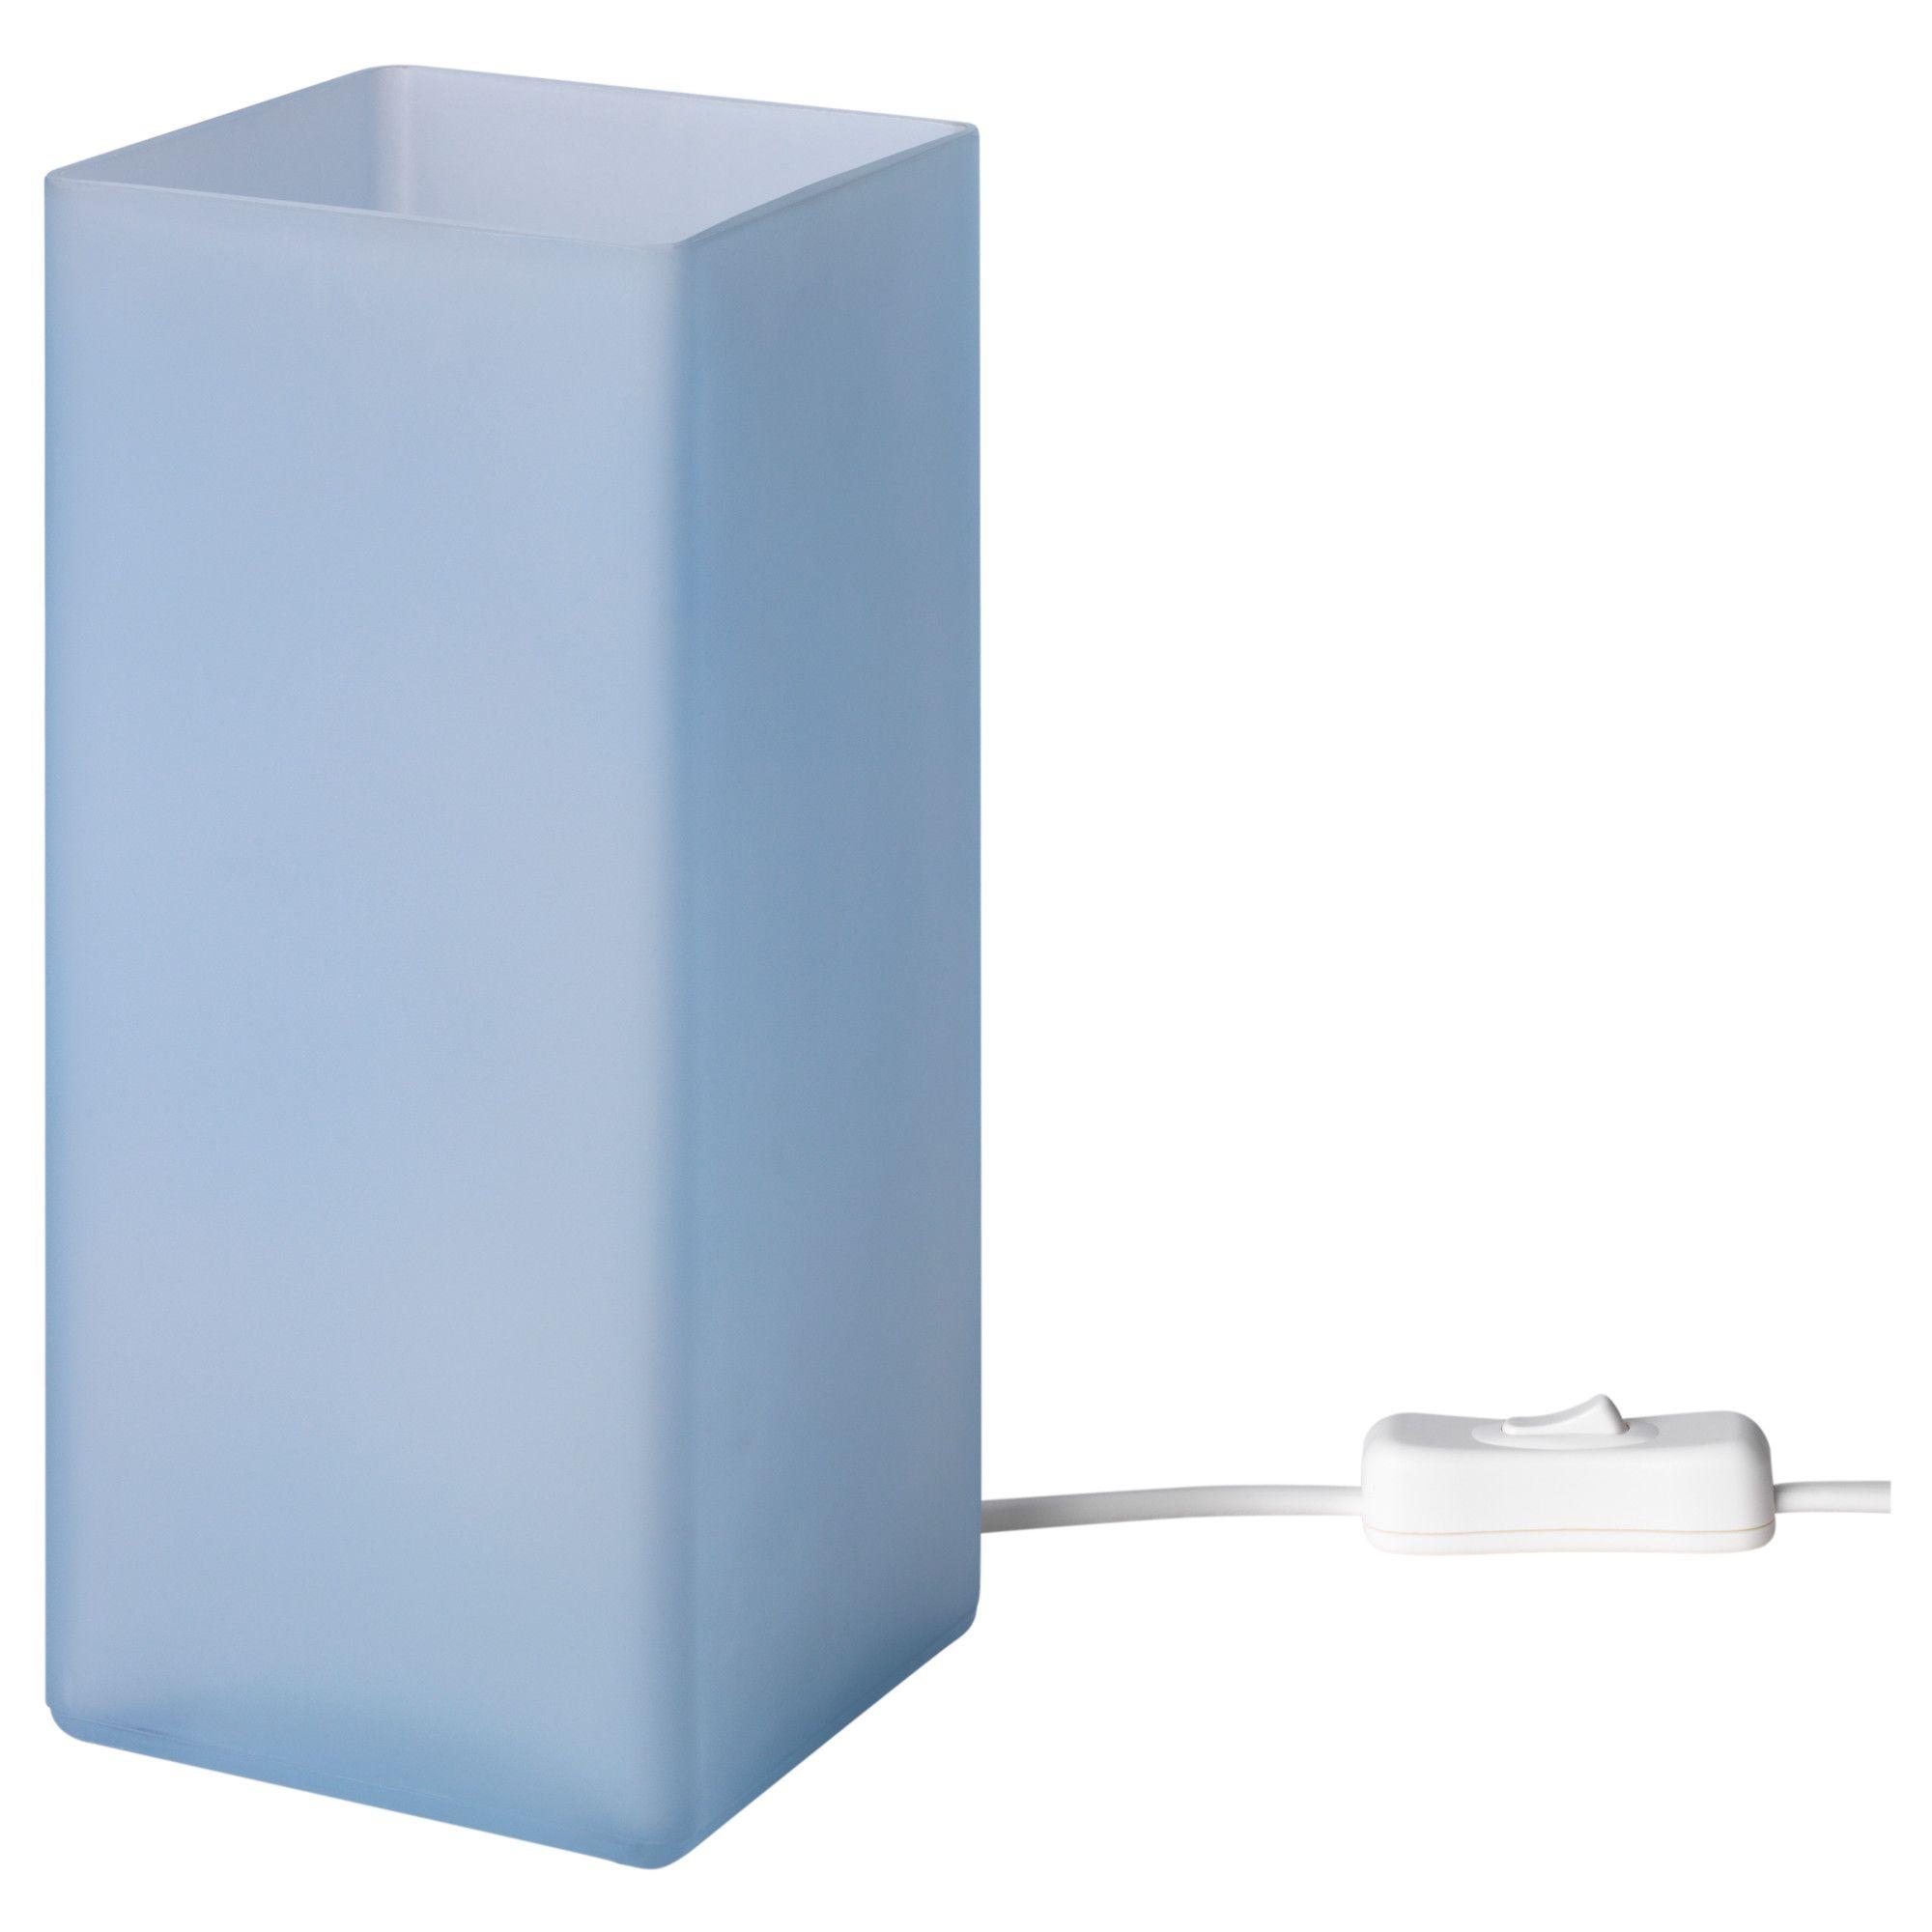 IKEA US Furniture and Home Furnishings | Ikea table lamp